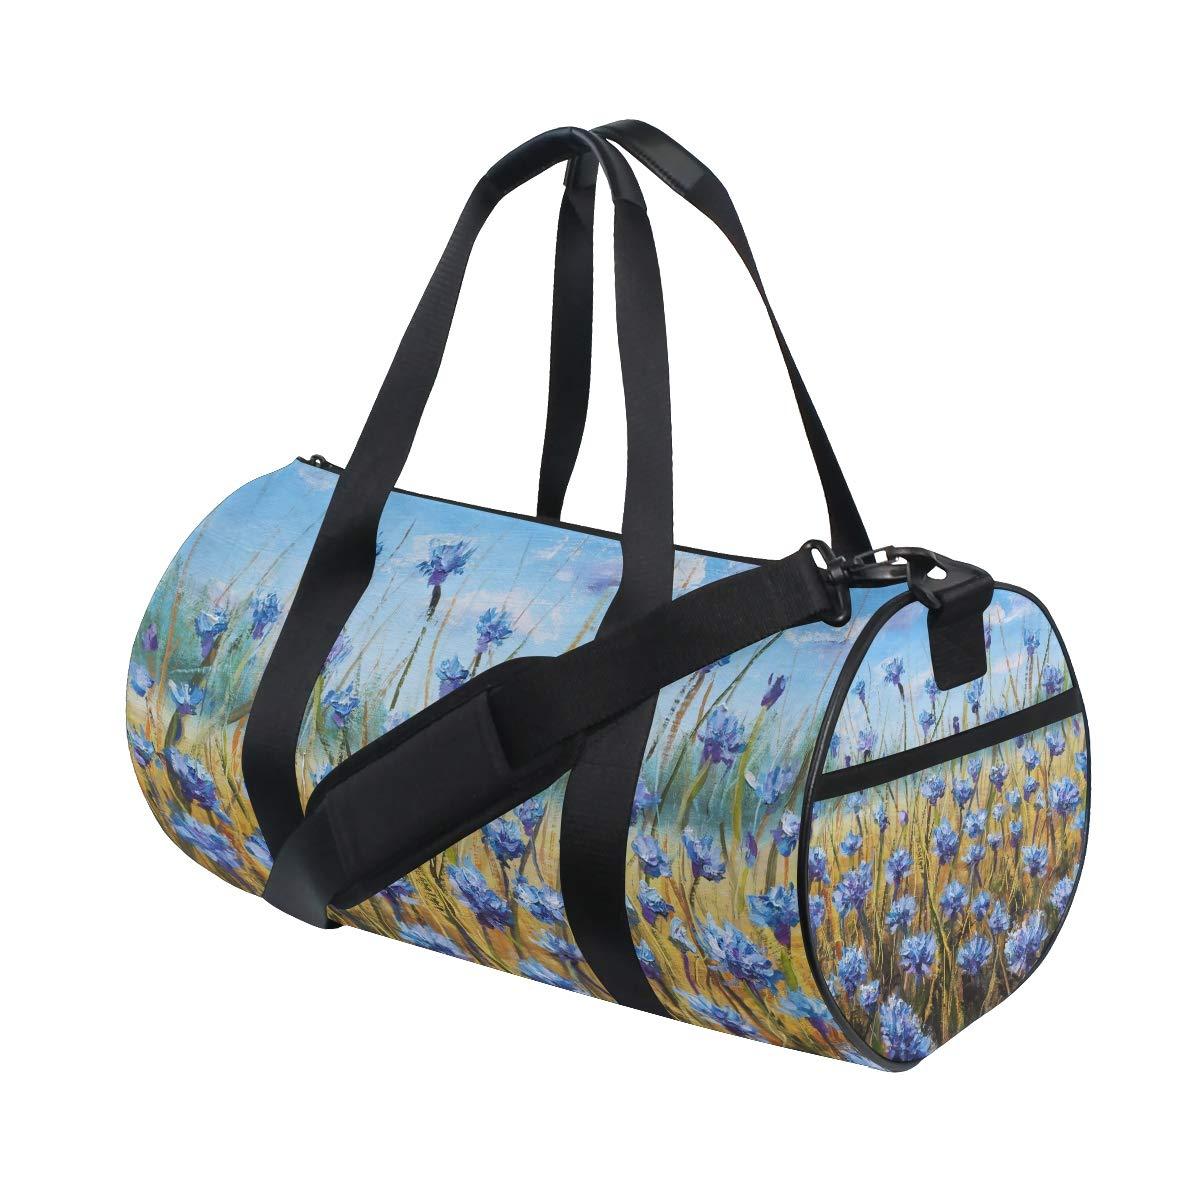 Blue Flowers Sports Gym Bag Travel Duffel Bag with Pockets Luggage & Travel Gear Shoulder Strap Fitness Bag